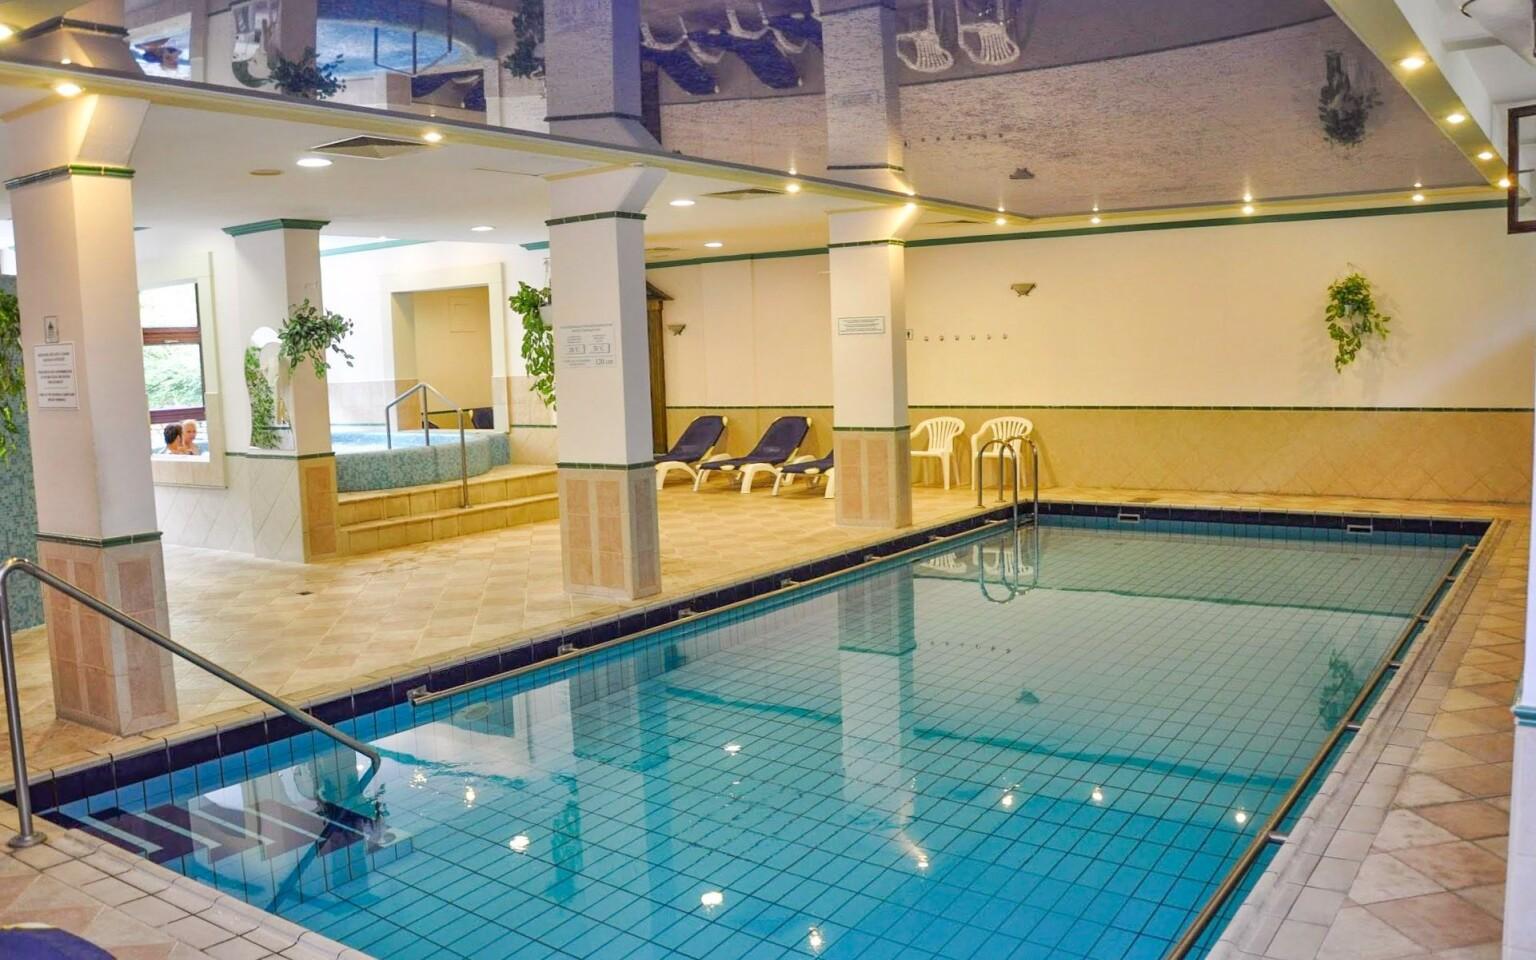 Navštivte hotelový plavecký bazén